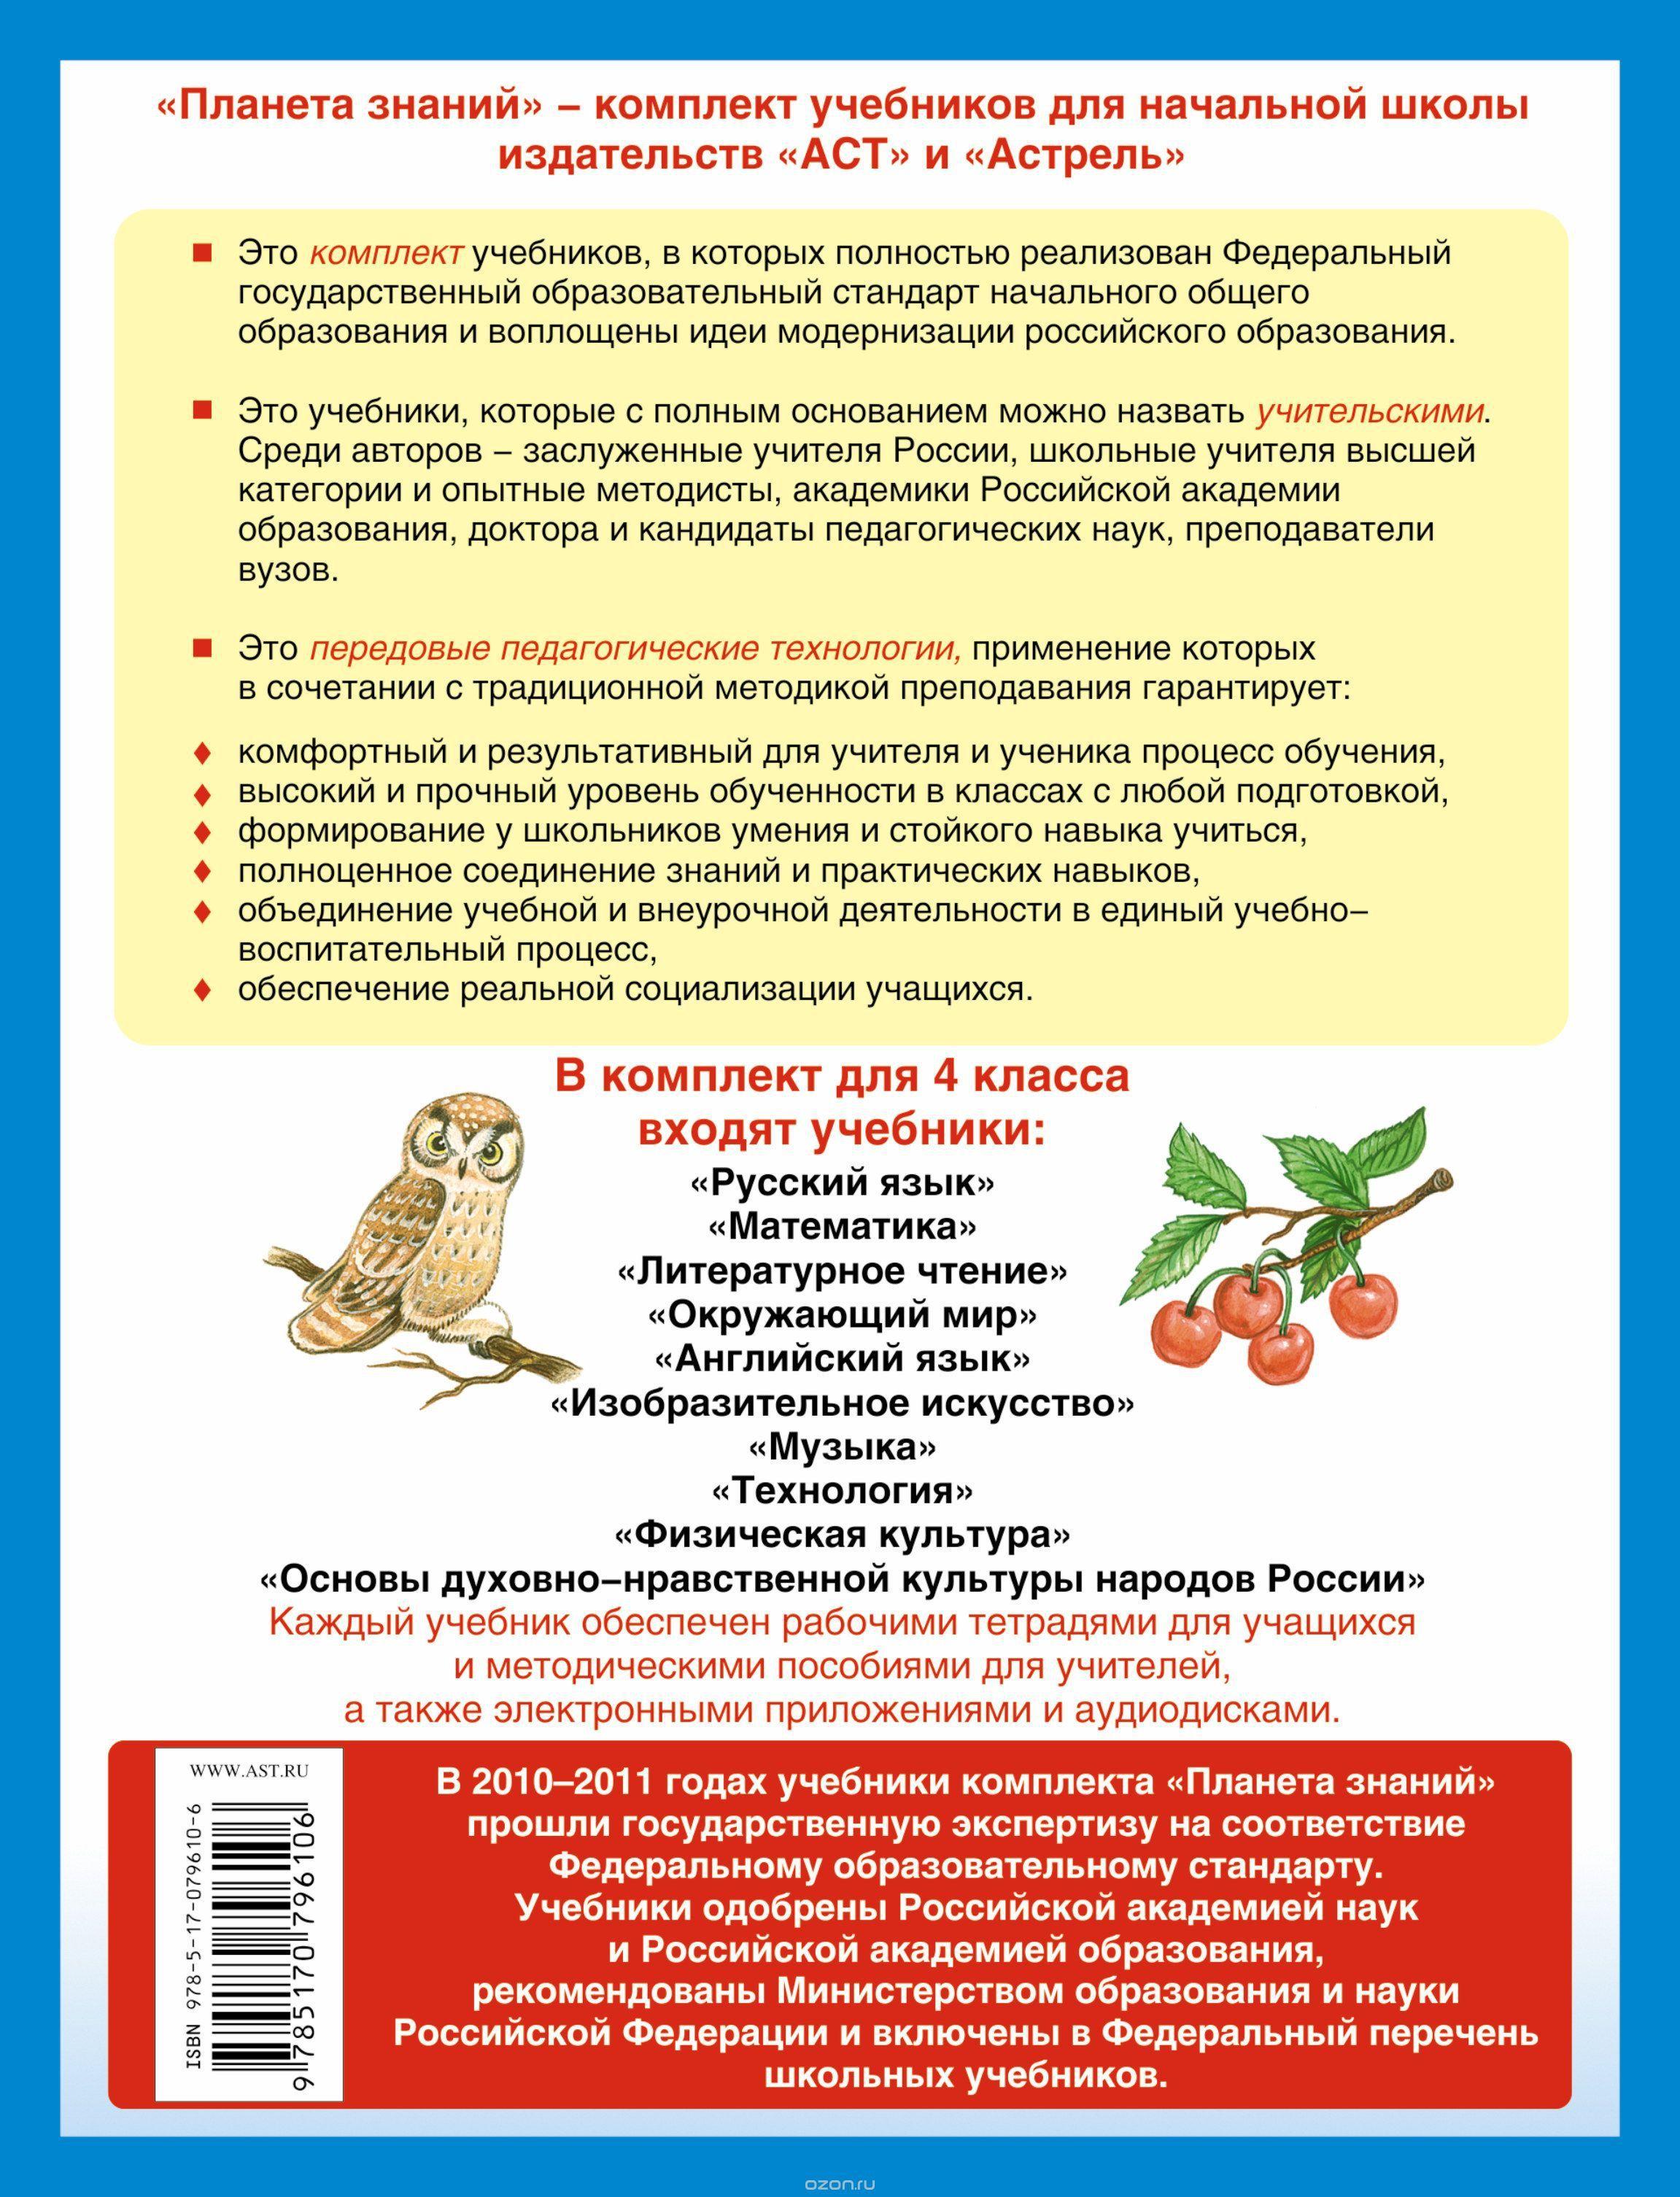 Перевод текста по английскому языку 7 класс britni spears   Учебник, Класс,  Уроки математики